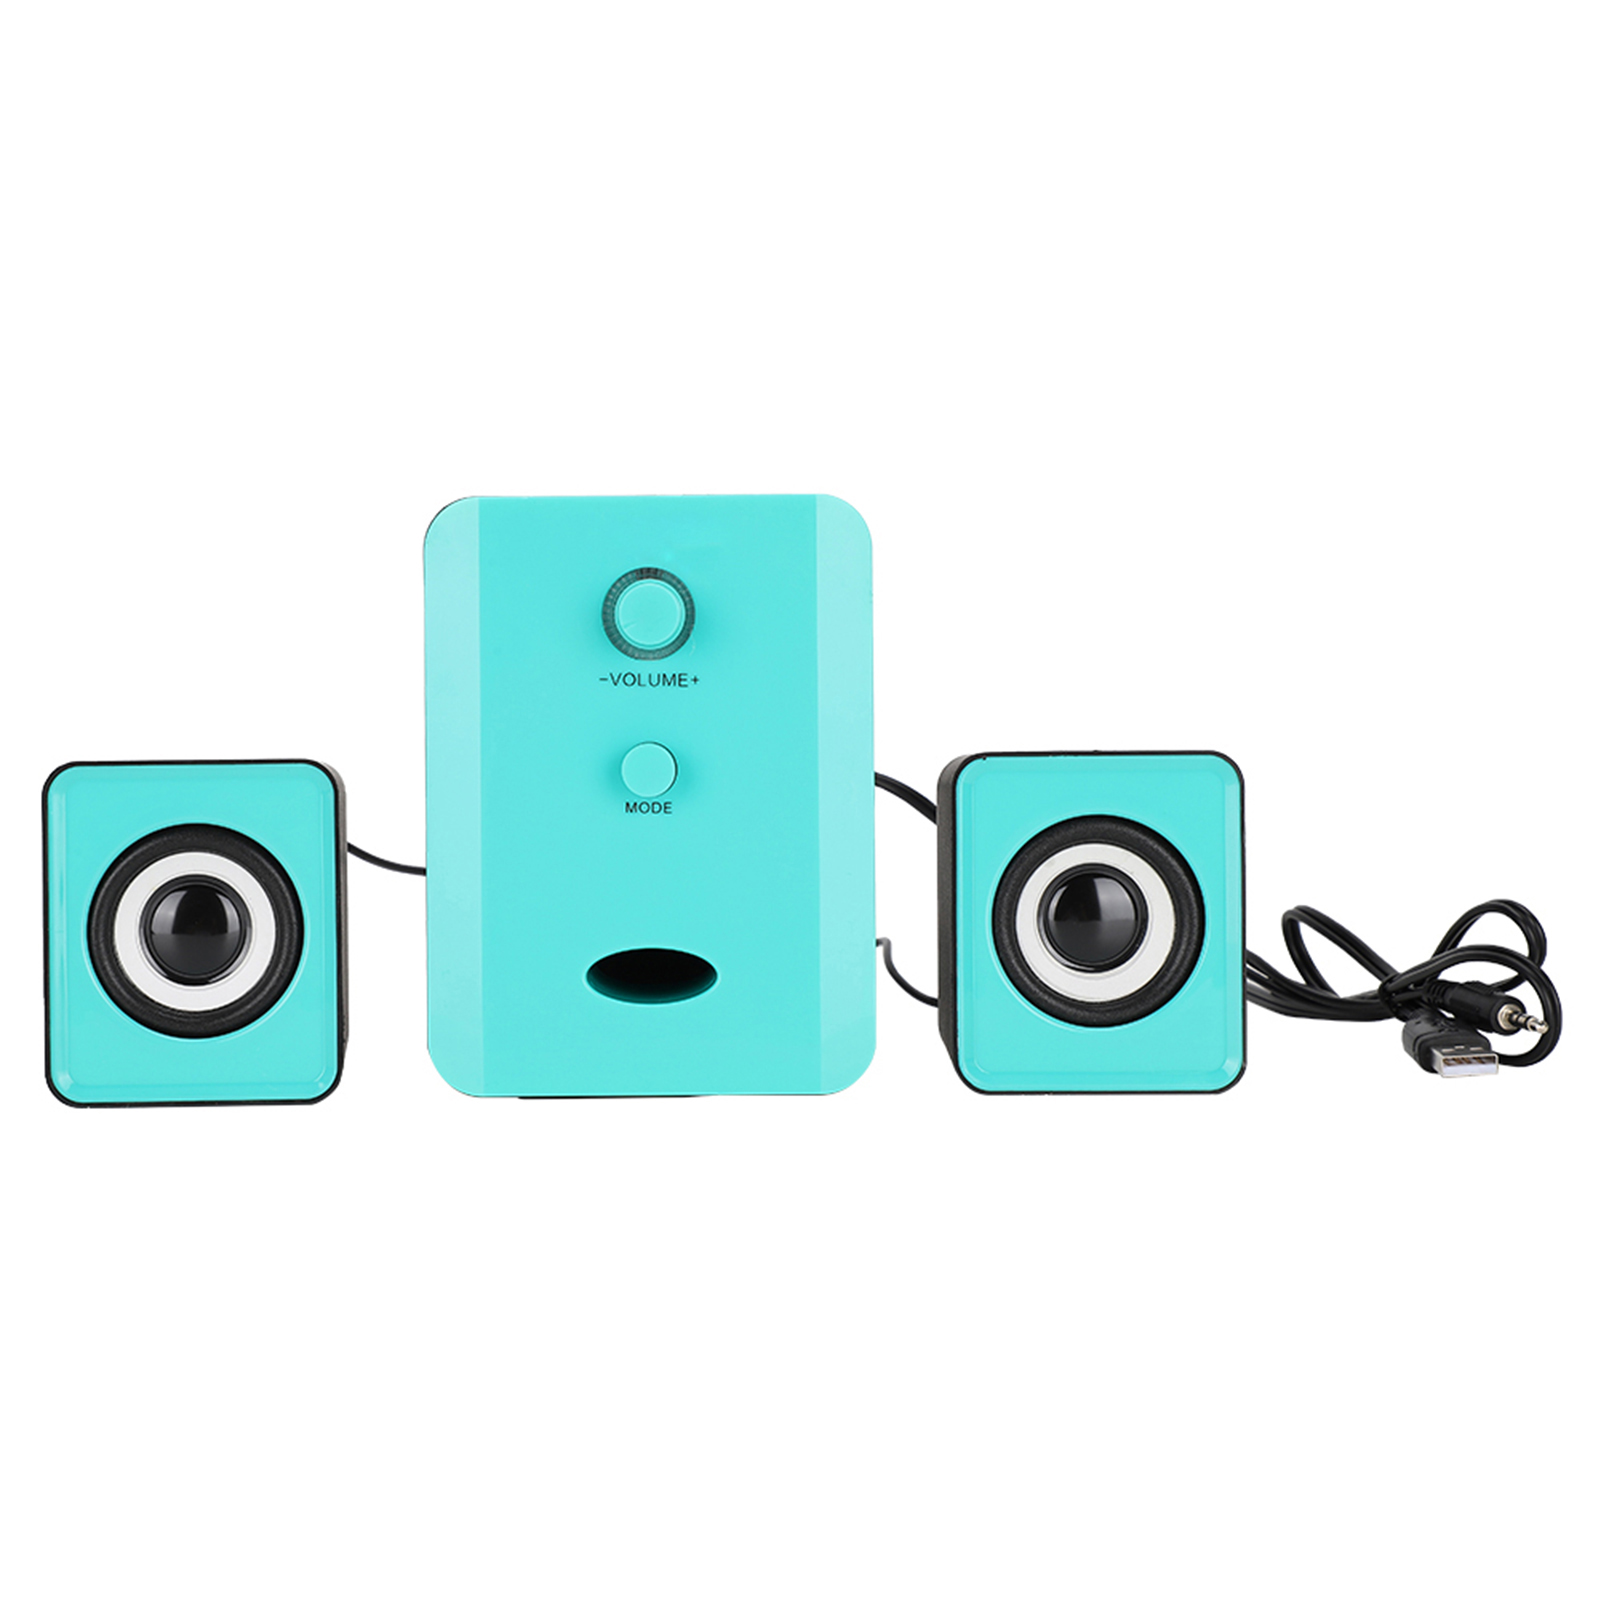 SADA-Bluetooth-Computer-Speaker-3-5mm-Desktop-Laptop-PC-Stereo-Bass-Subwoofer-SS thumbnail 91